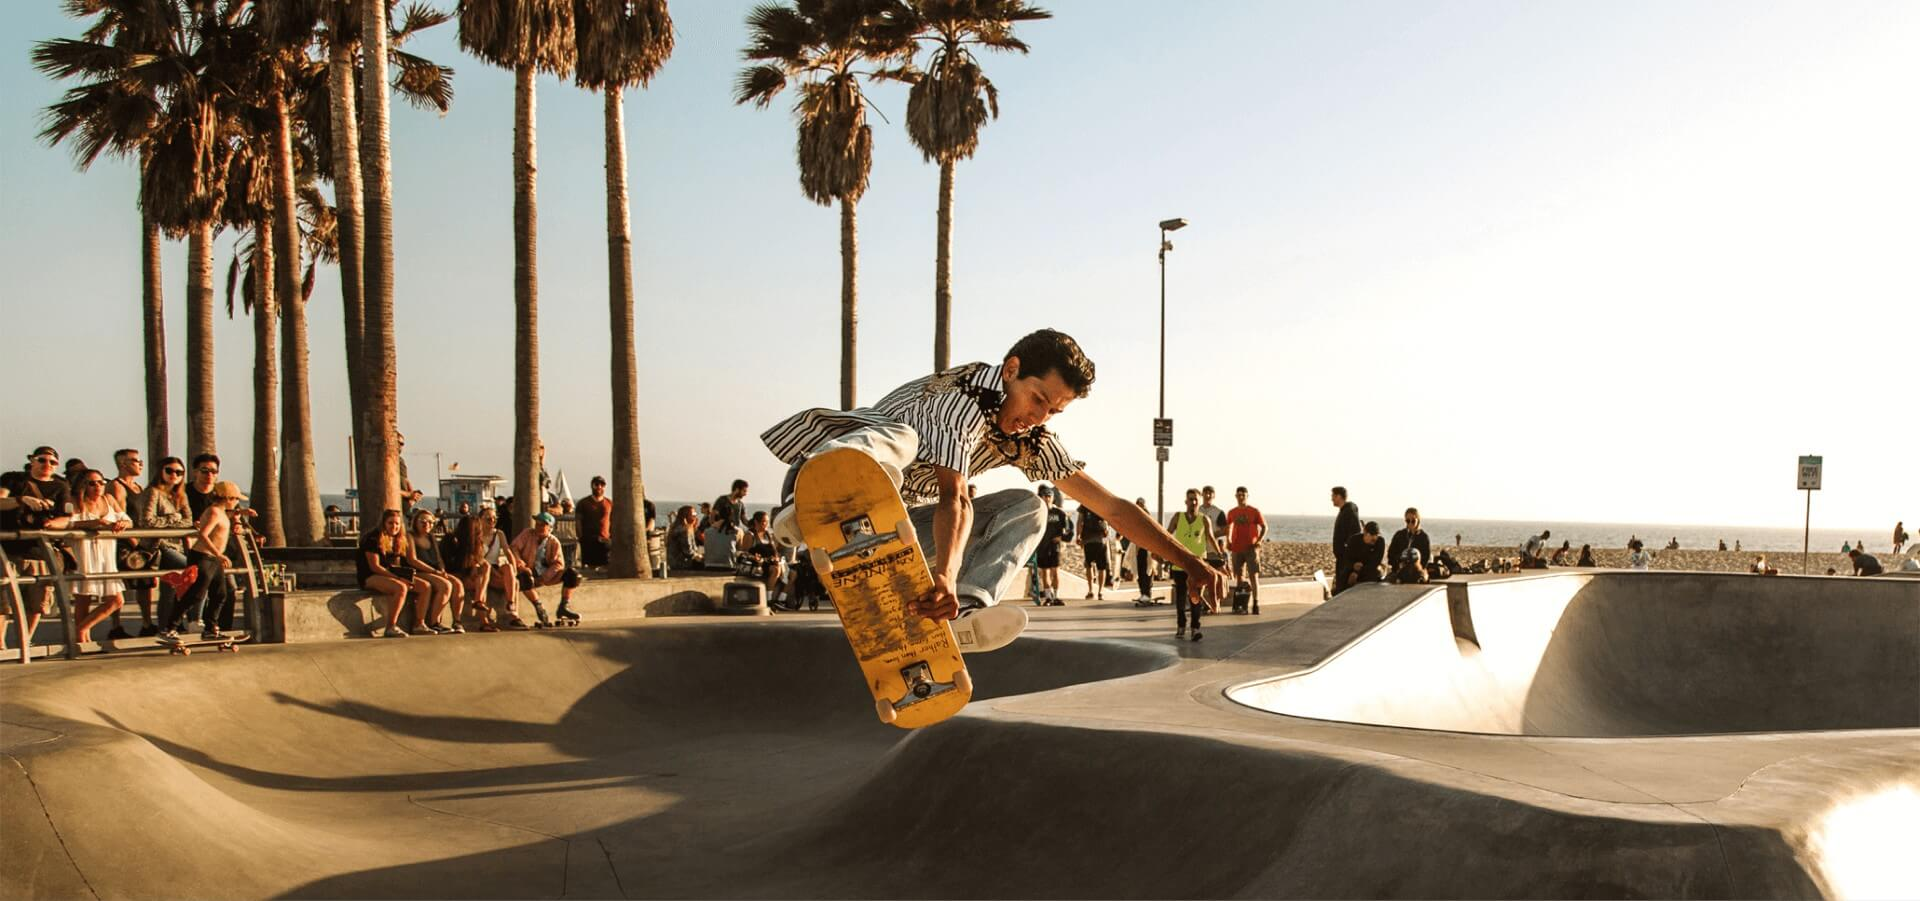 Skateboard Video